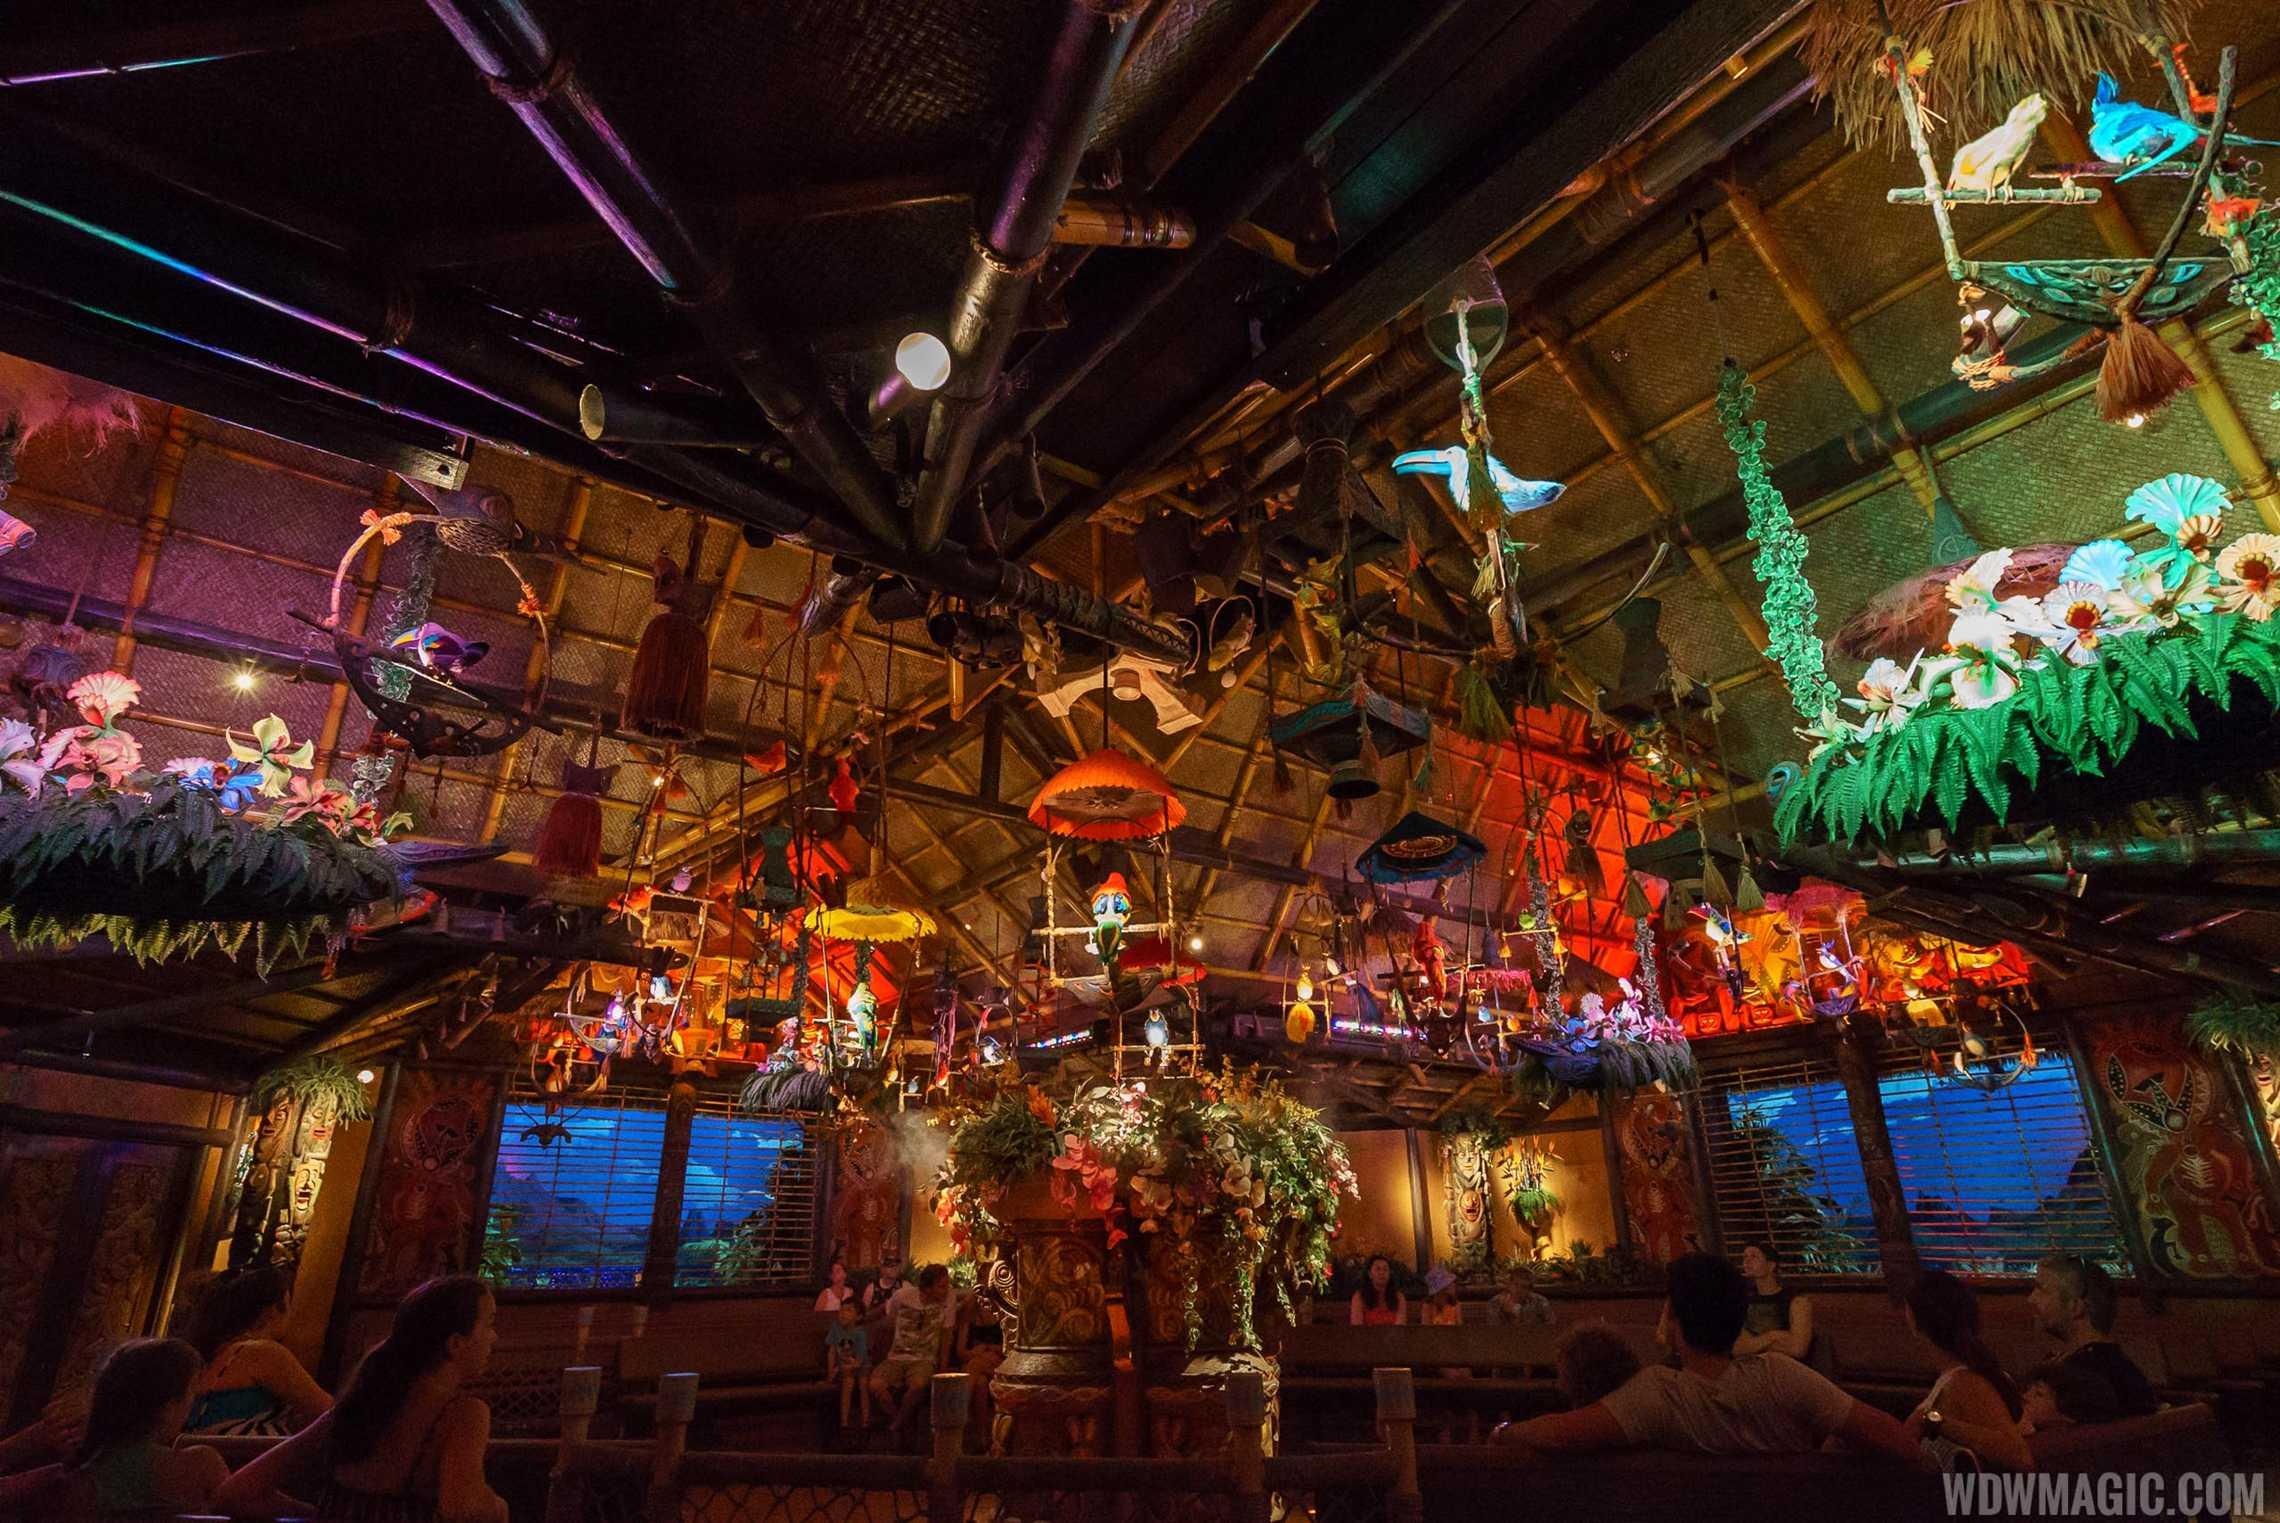 Walt Disney's Enchanted Tiki Room show